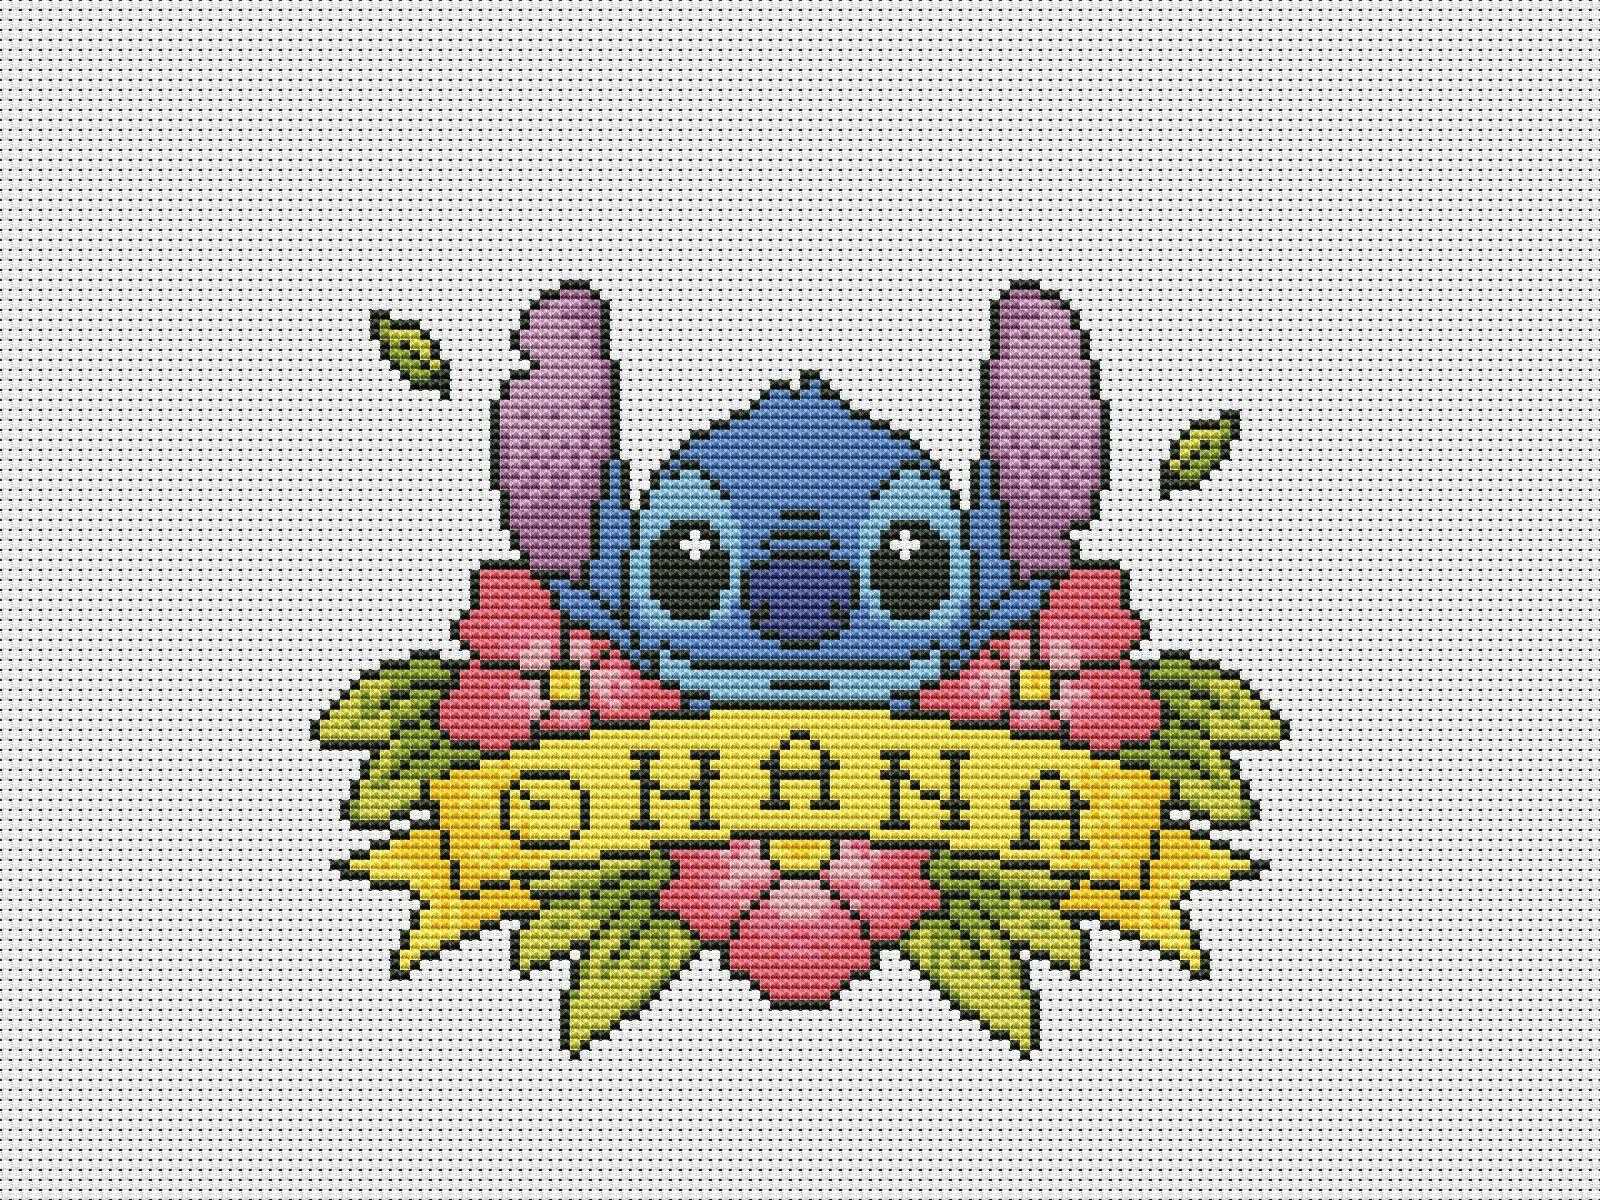 Disney cross stitch pattern